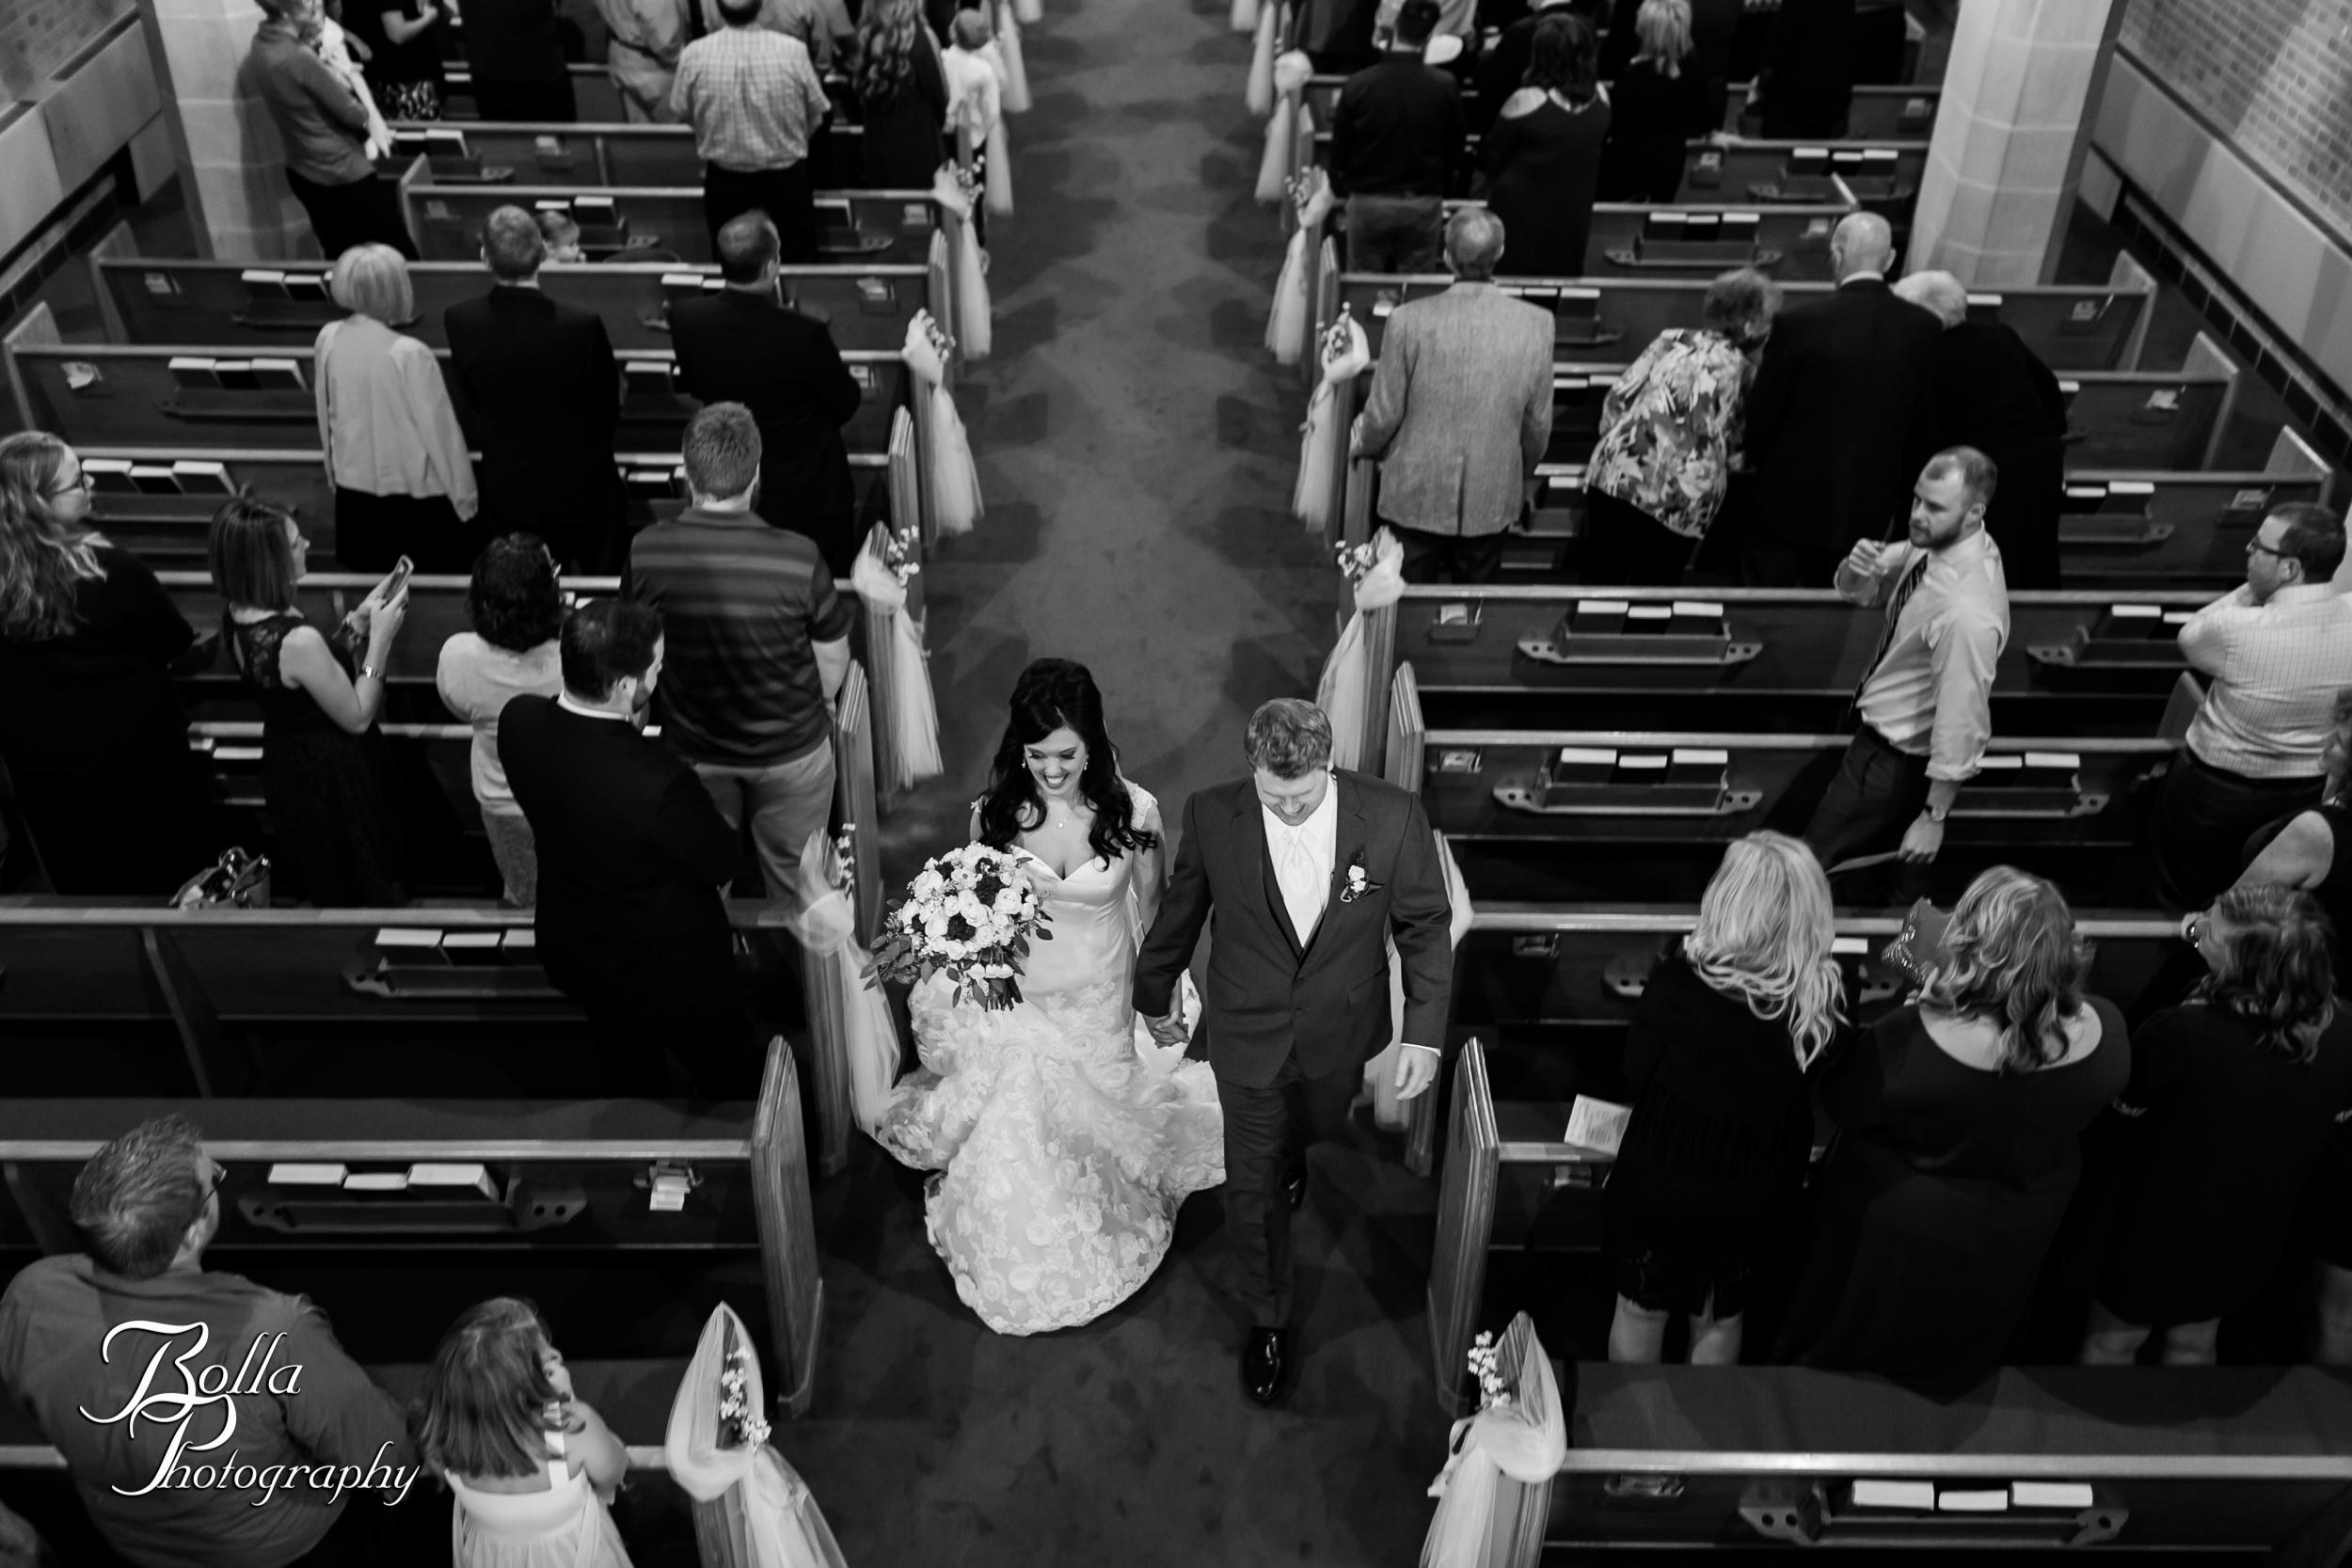 Bolla_photography_edwardsville_wedding_photographer_st_louis_weddings_Reilmann-0202.jpg